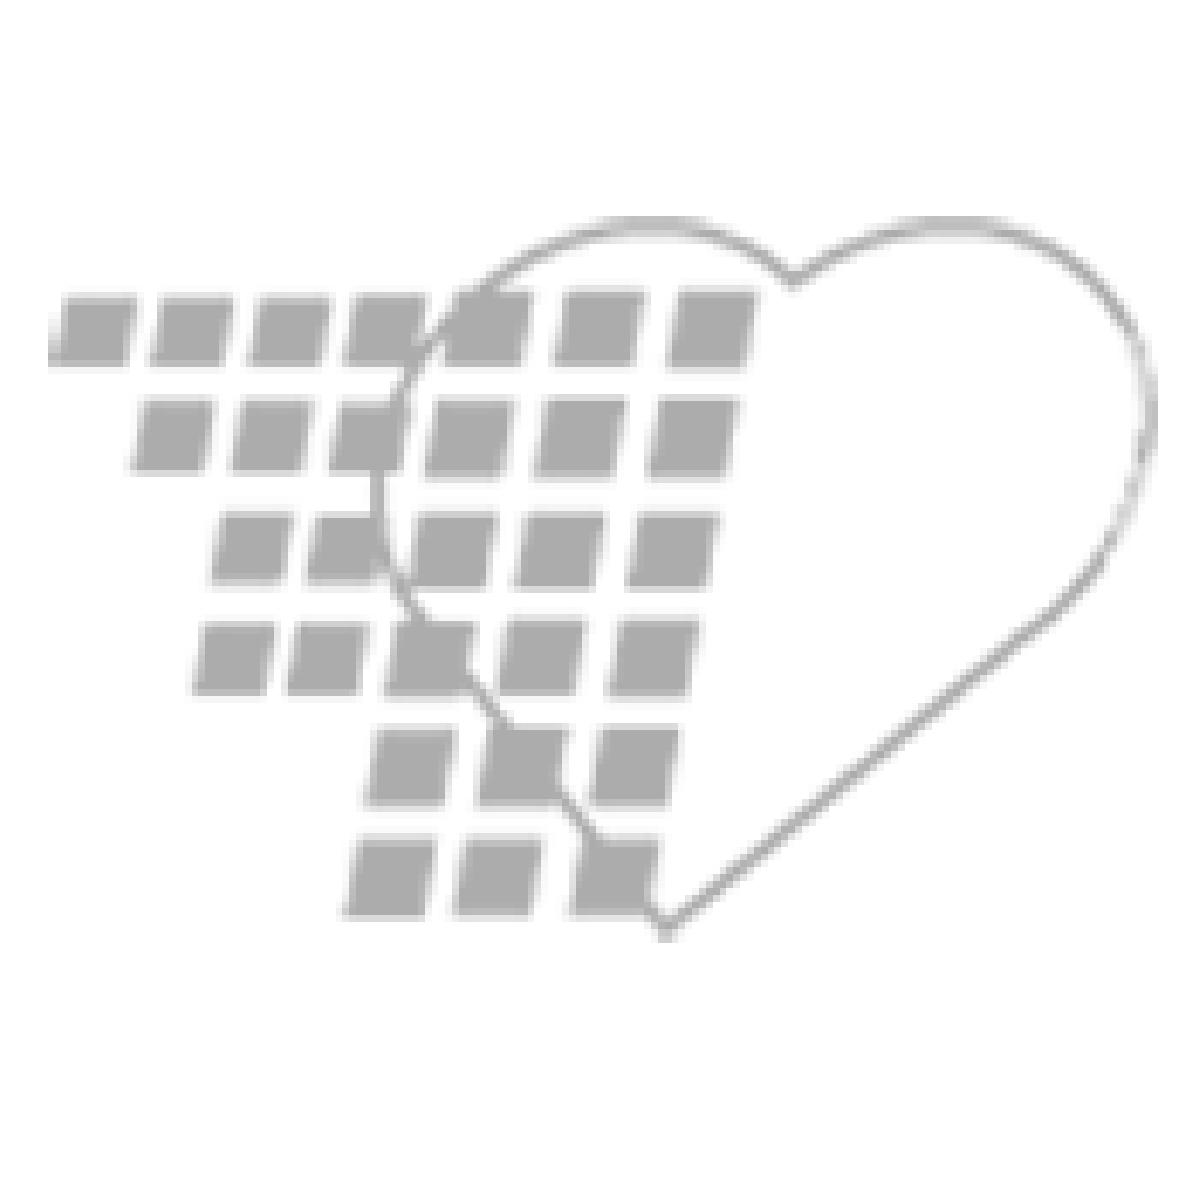 06-93-0104 Demo Dose® Tylenl #3 300mg/30mg - Sheet of 24